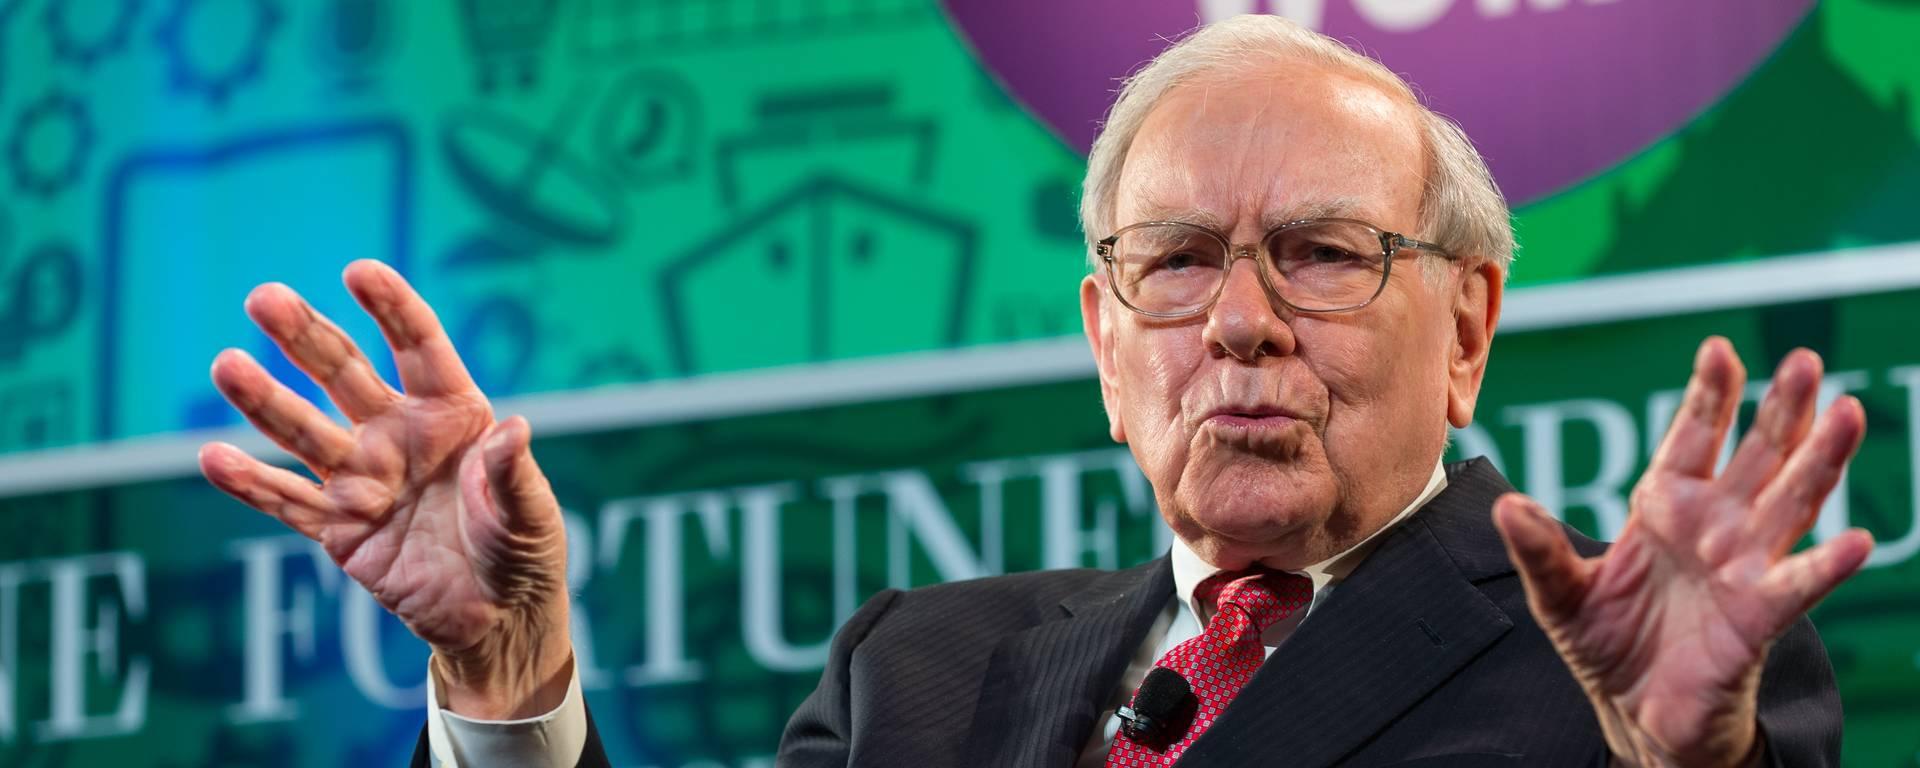 Warren Buffett at Fortune The Most Powerful Women 2013